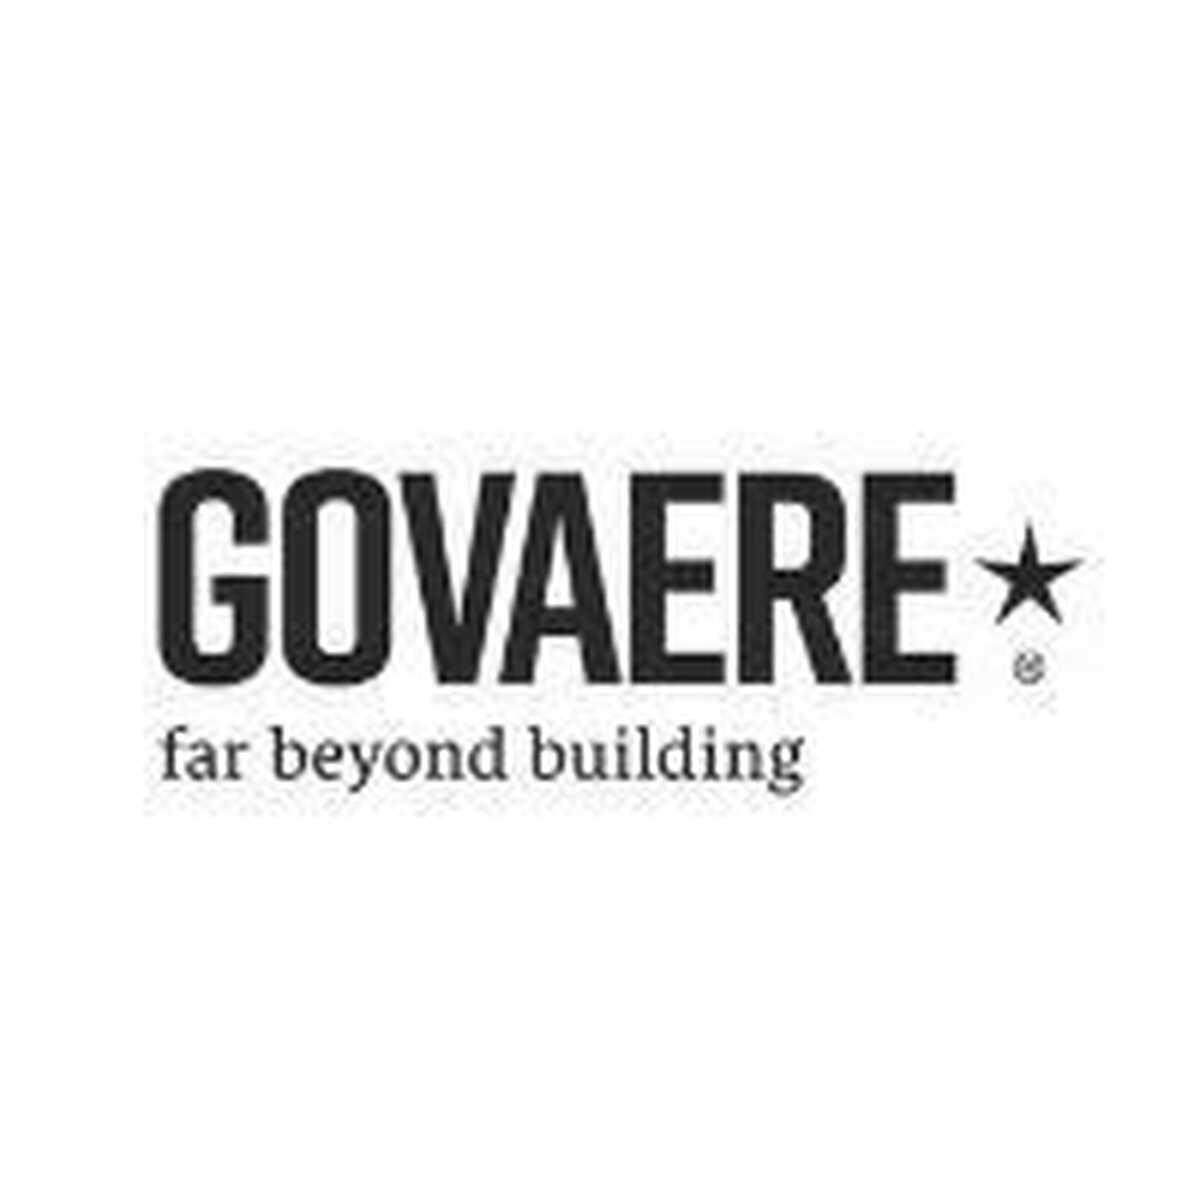 Govaere